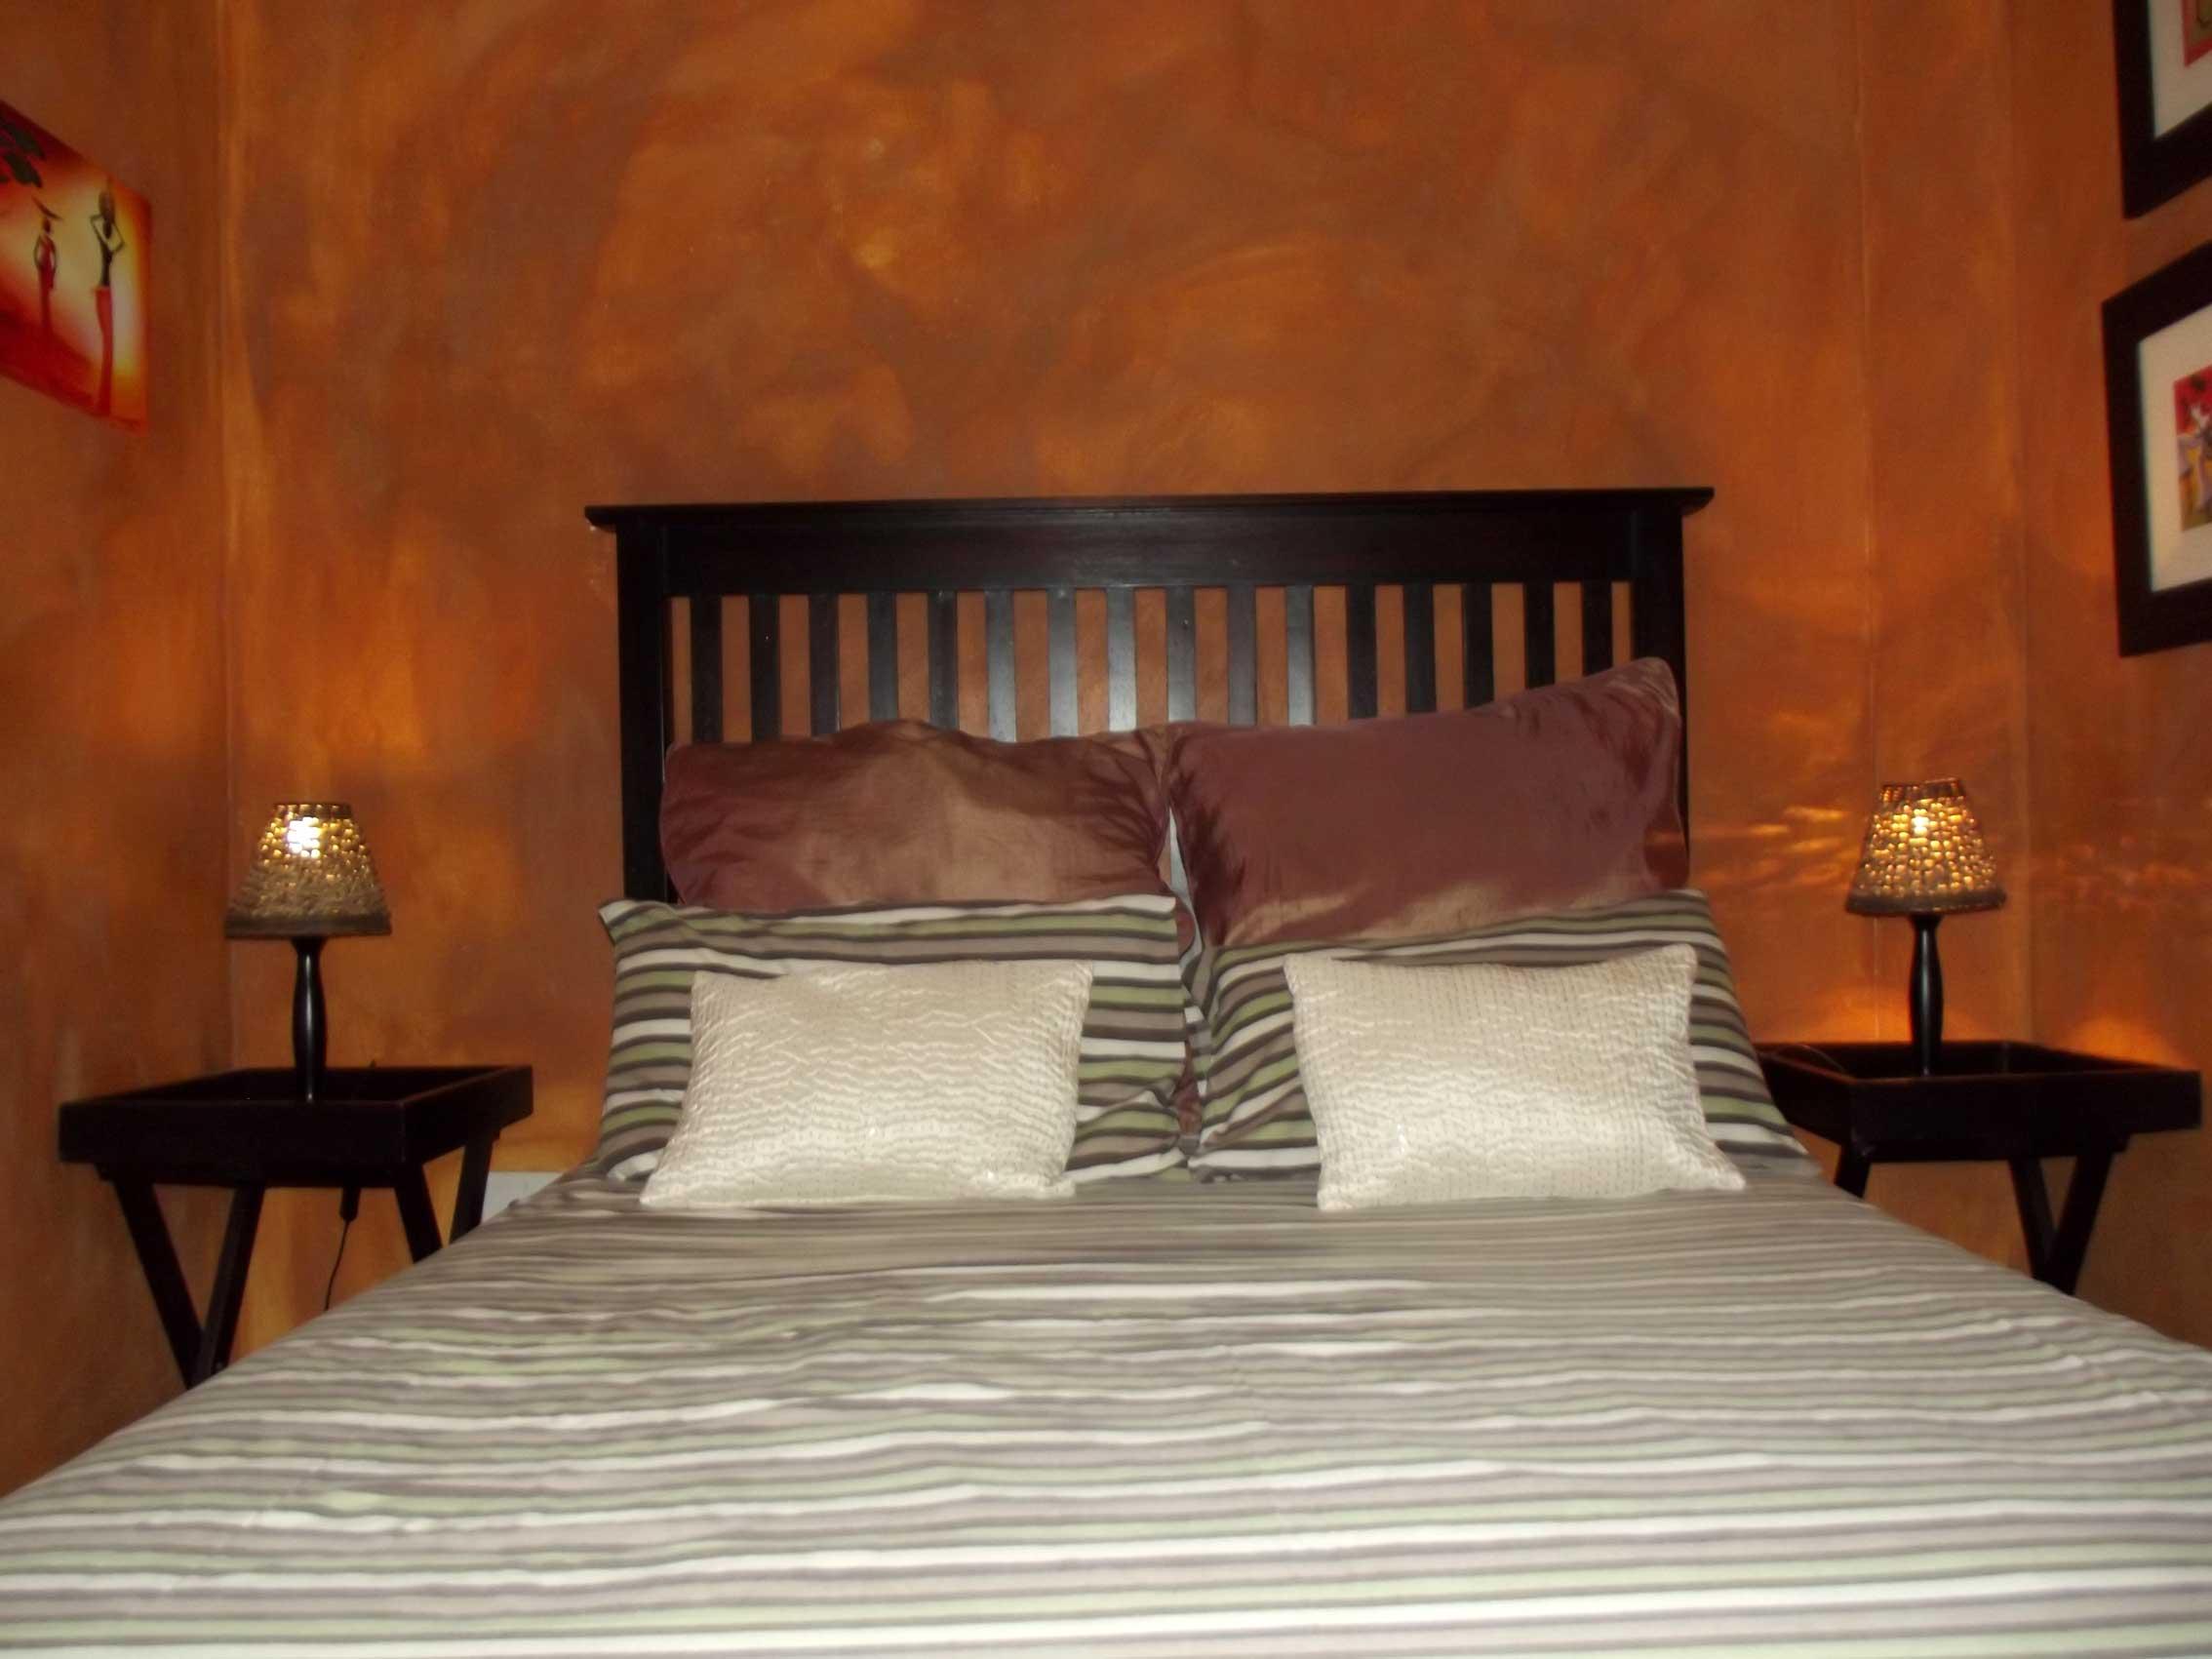 Boulevard 5 - Margate - Self Catering - Holiday - Accommodation - Sleeps 4